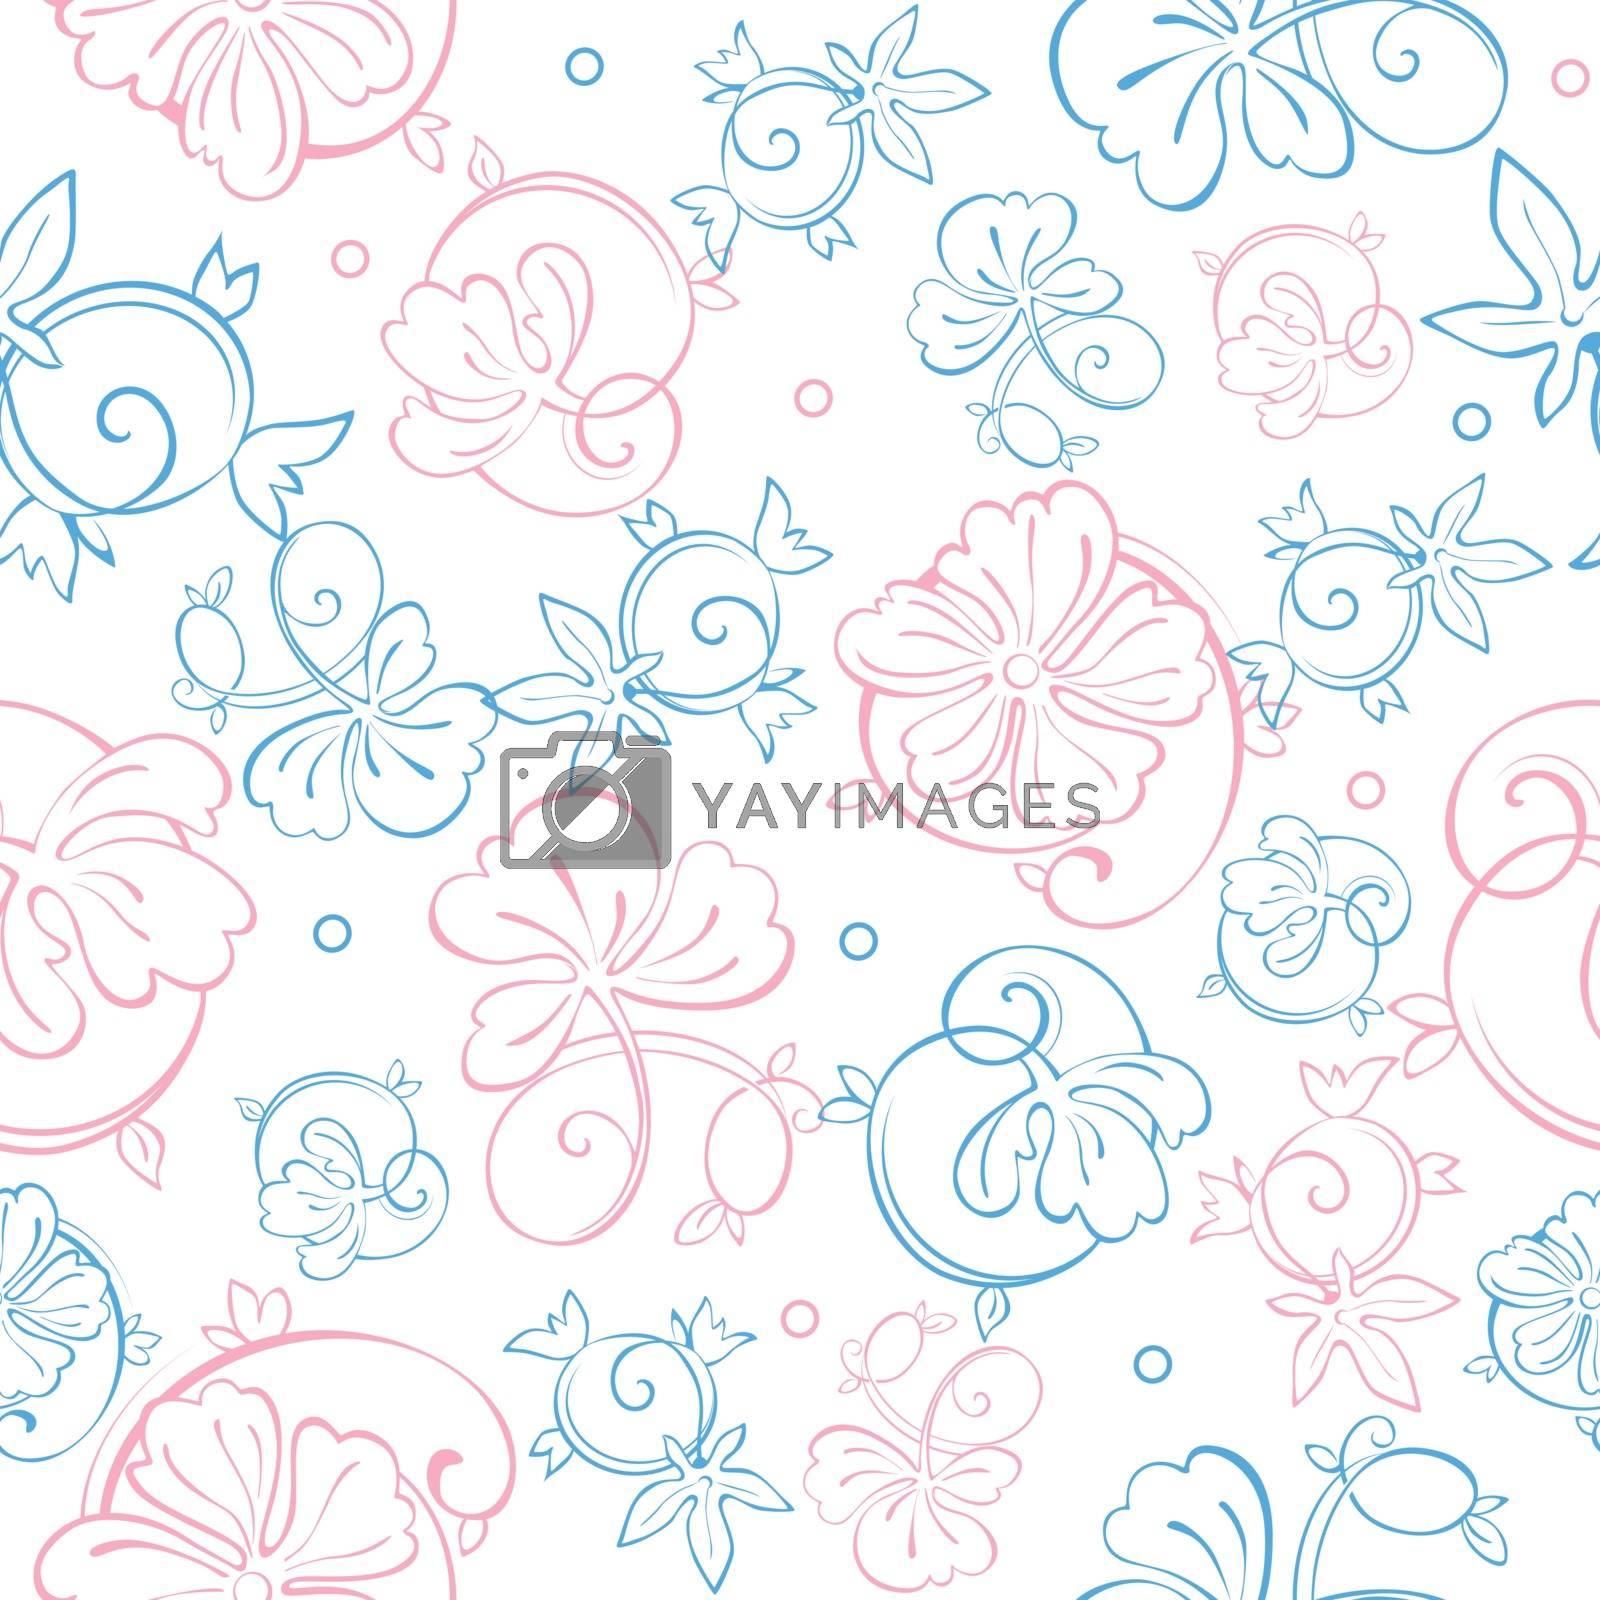 Vector Pink Blue Pastel Floral Swirls Seamless Pattern graphic design